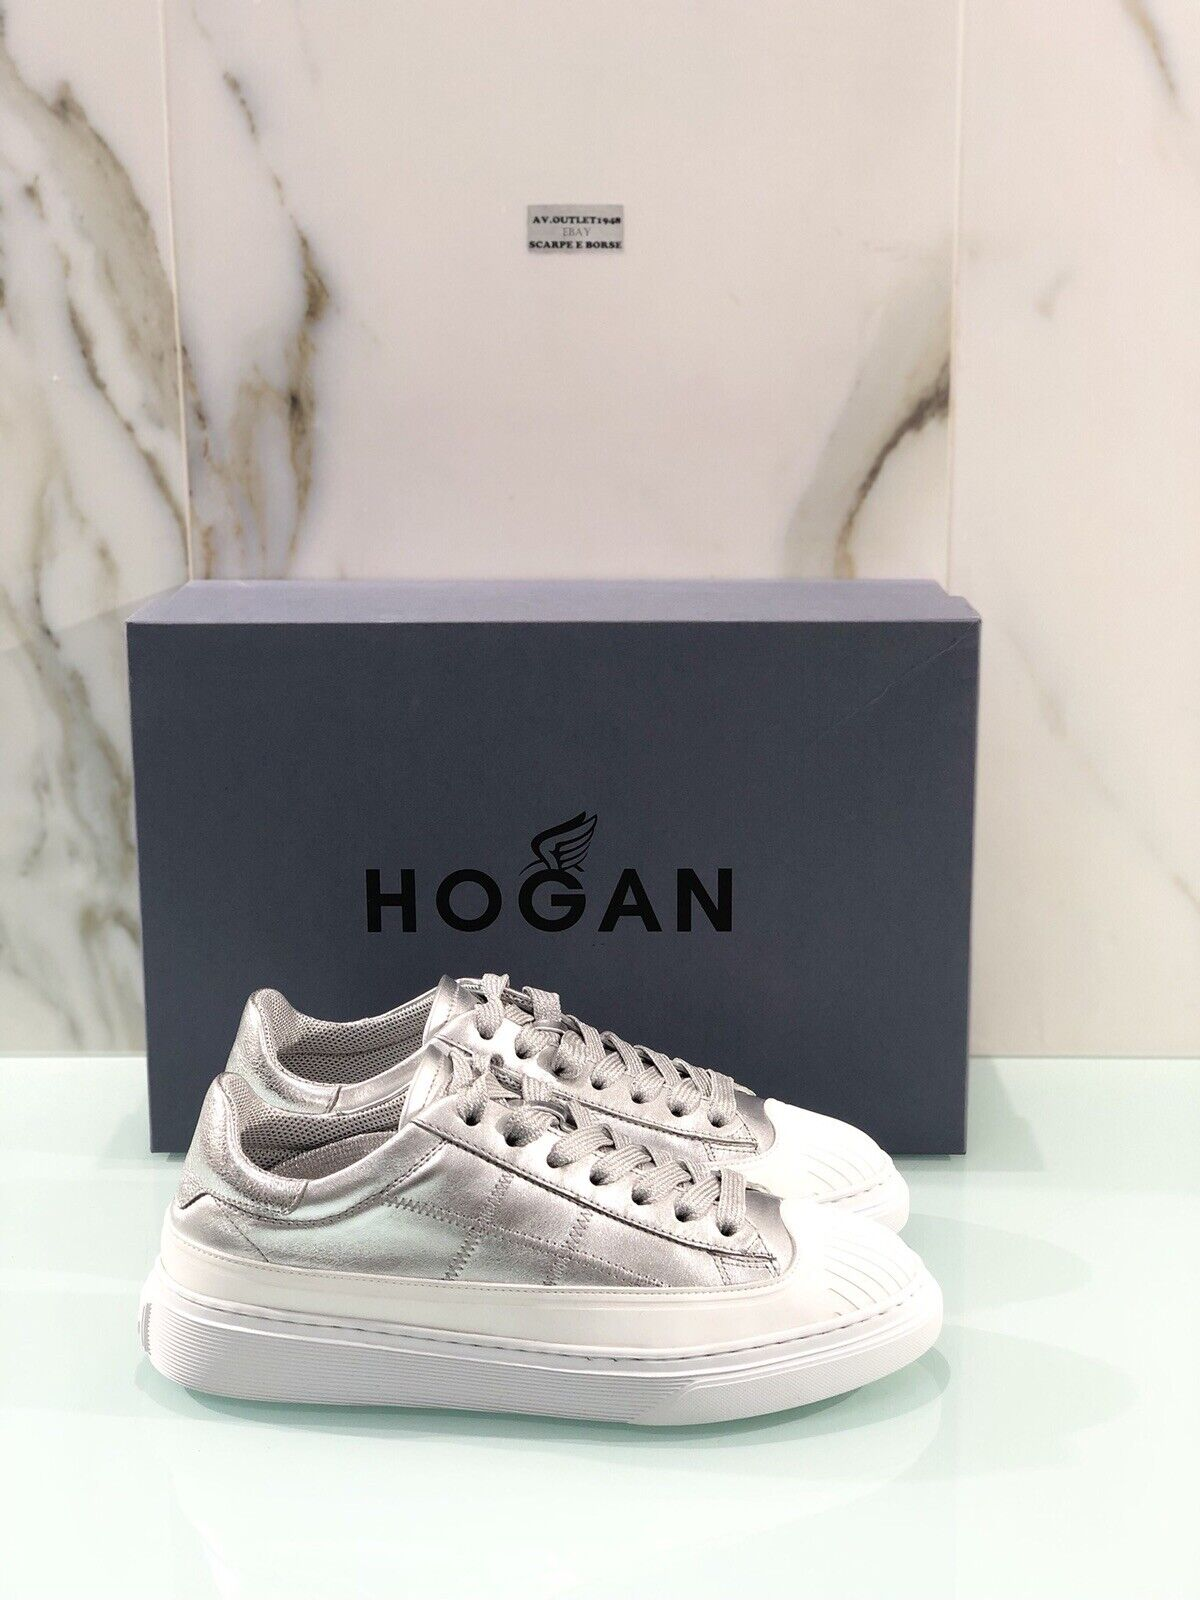 Hogan H365 Niedrig Cut Dröhn aus Leder Silber Casual Sportschuhe Hogan Frau